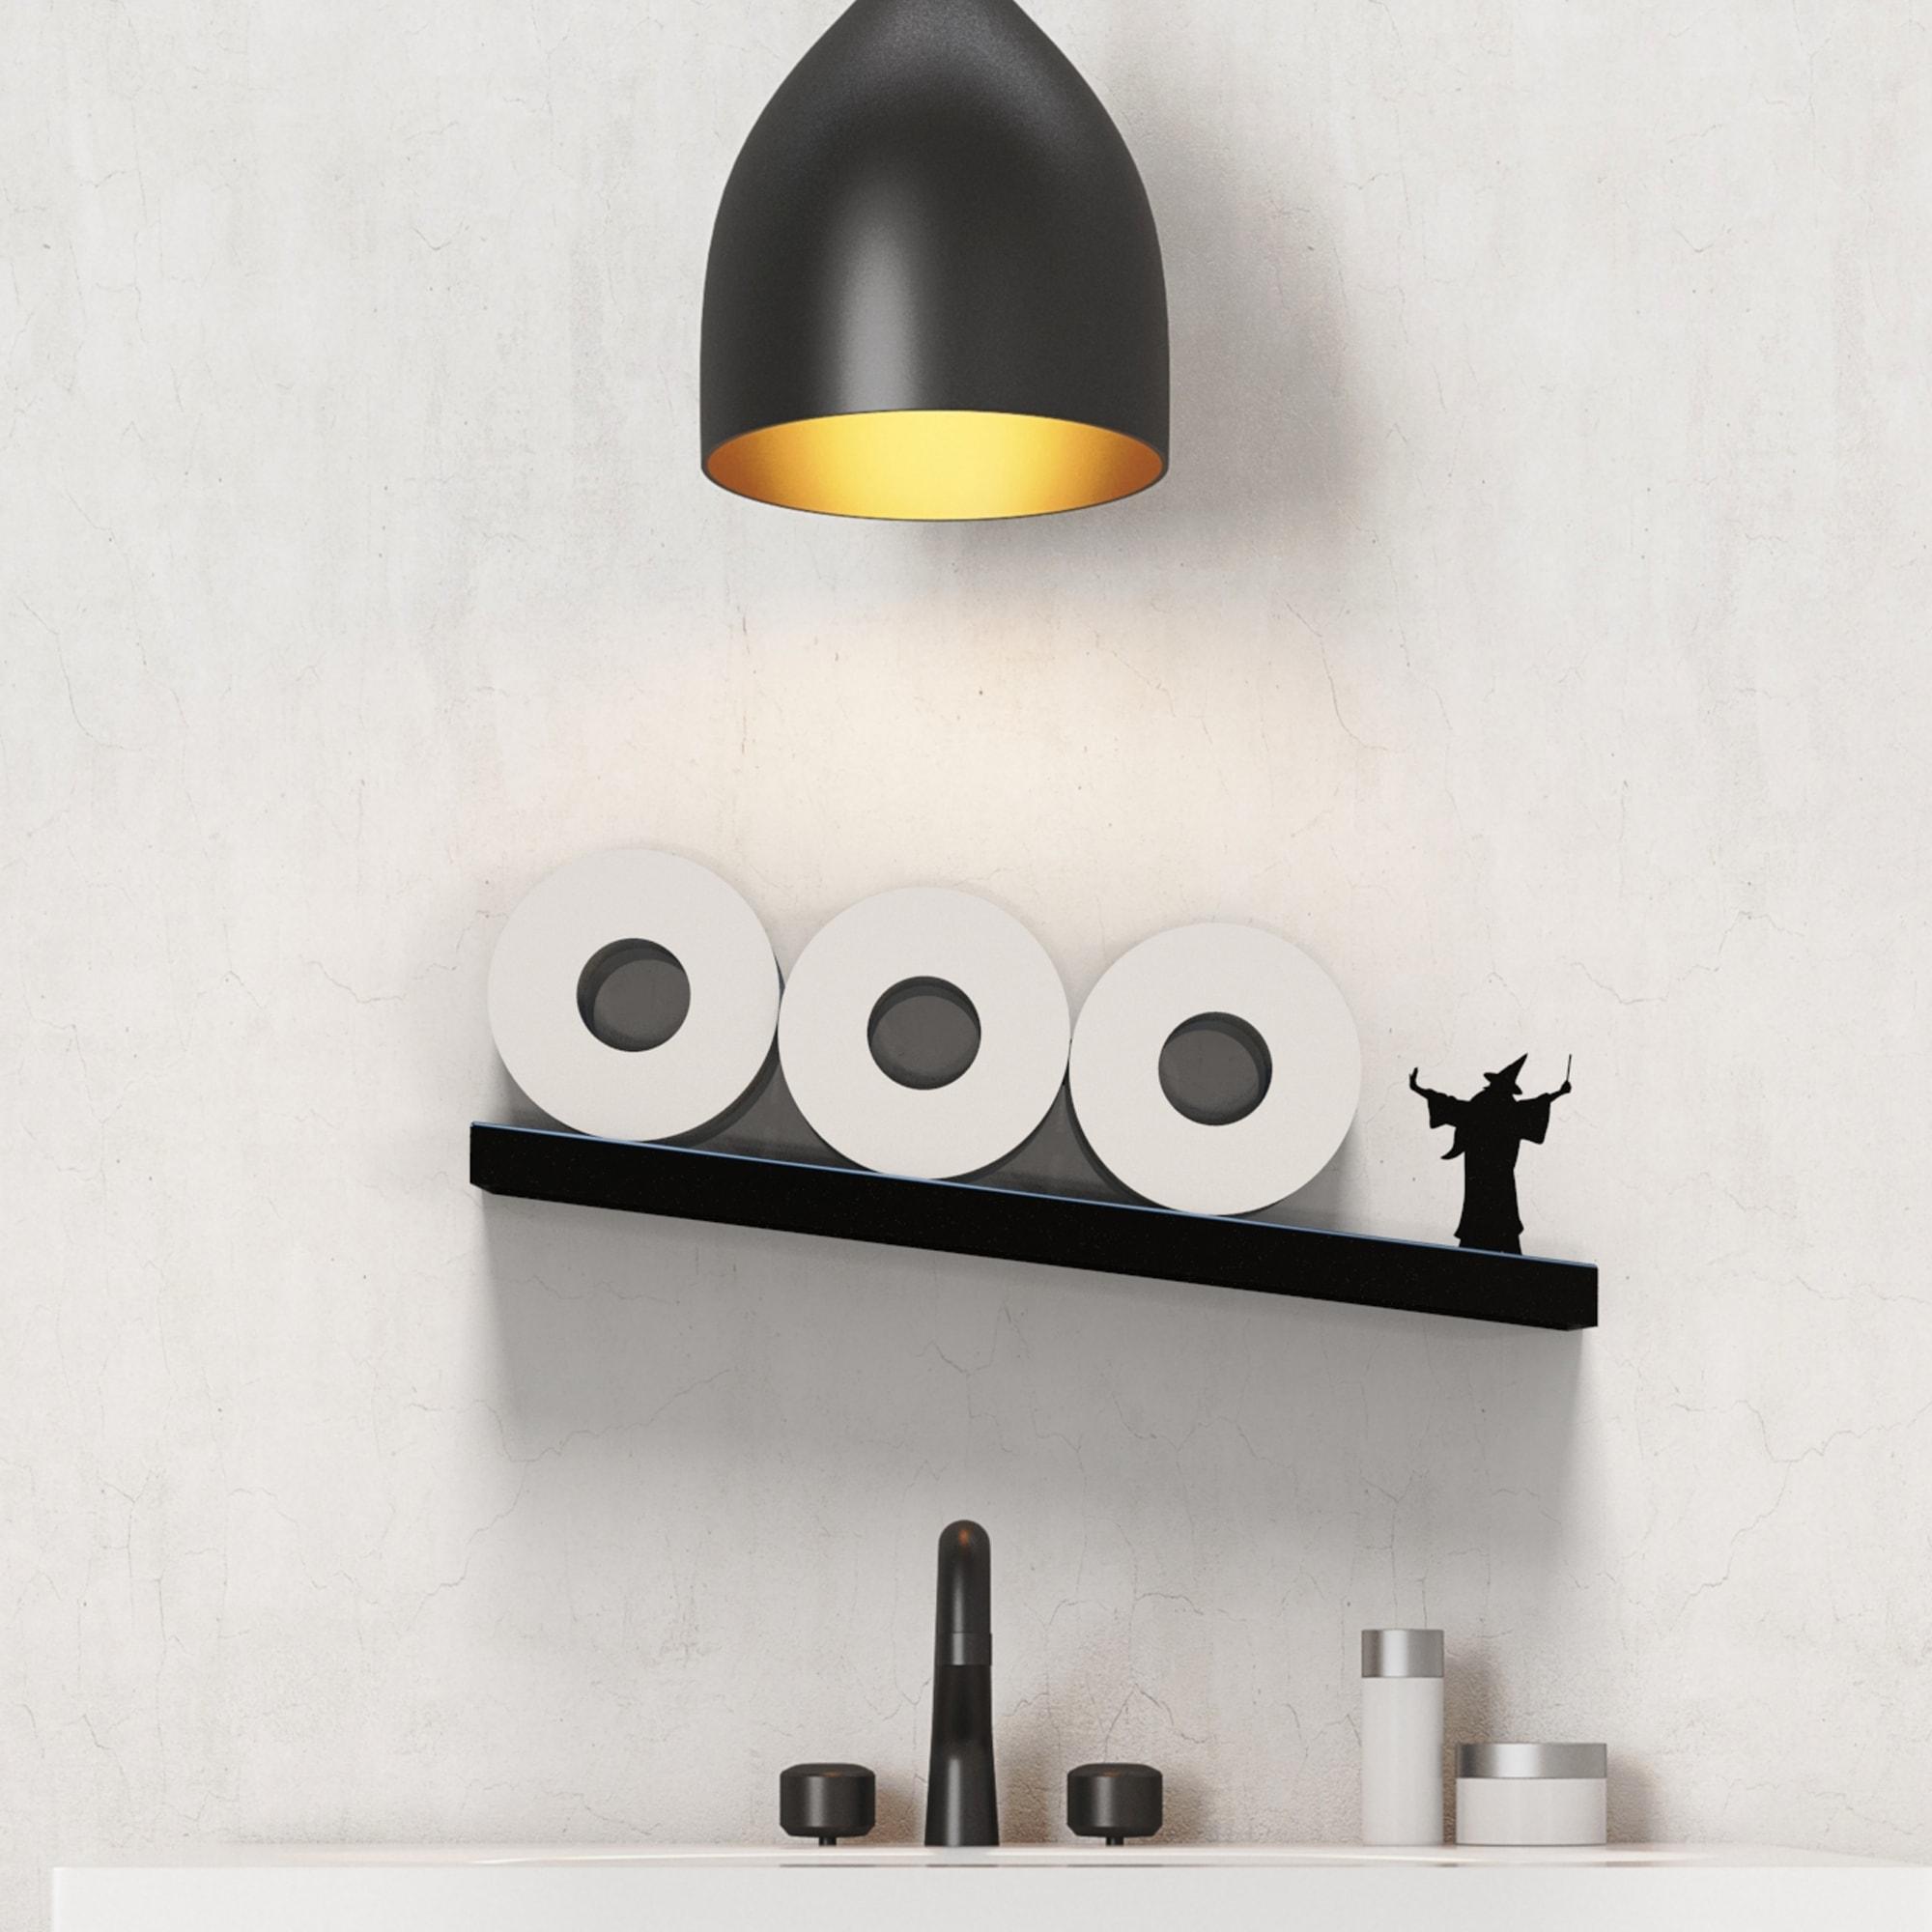 Merlin by Artori Design